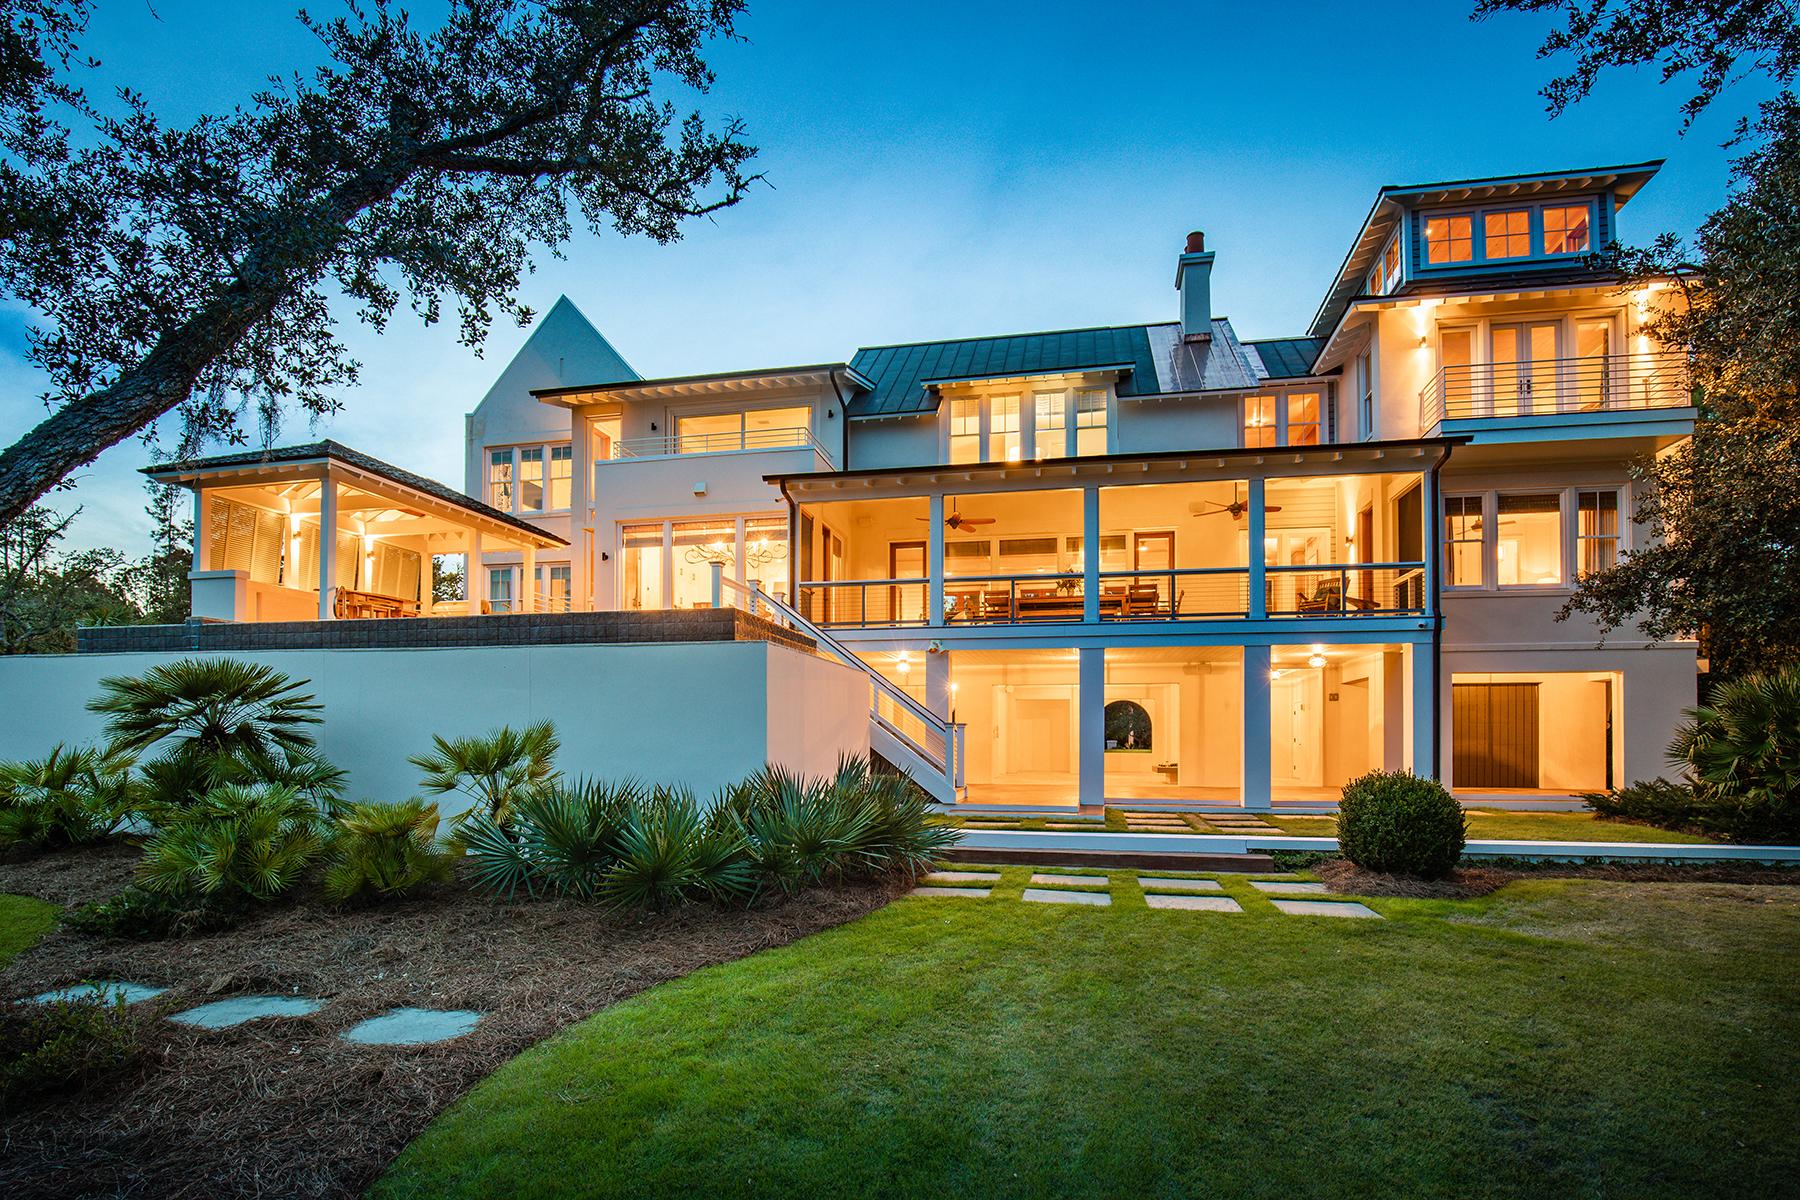 Single Family Homes for Active at 3016 Vanderbilt Boulevard Pawleys Island, South Carolina 29585 United States